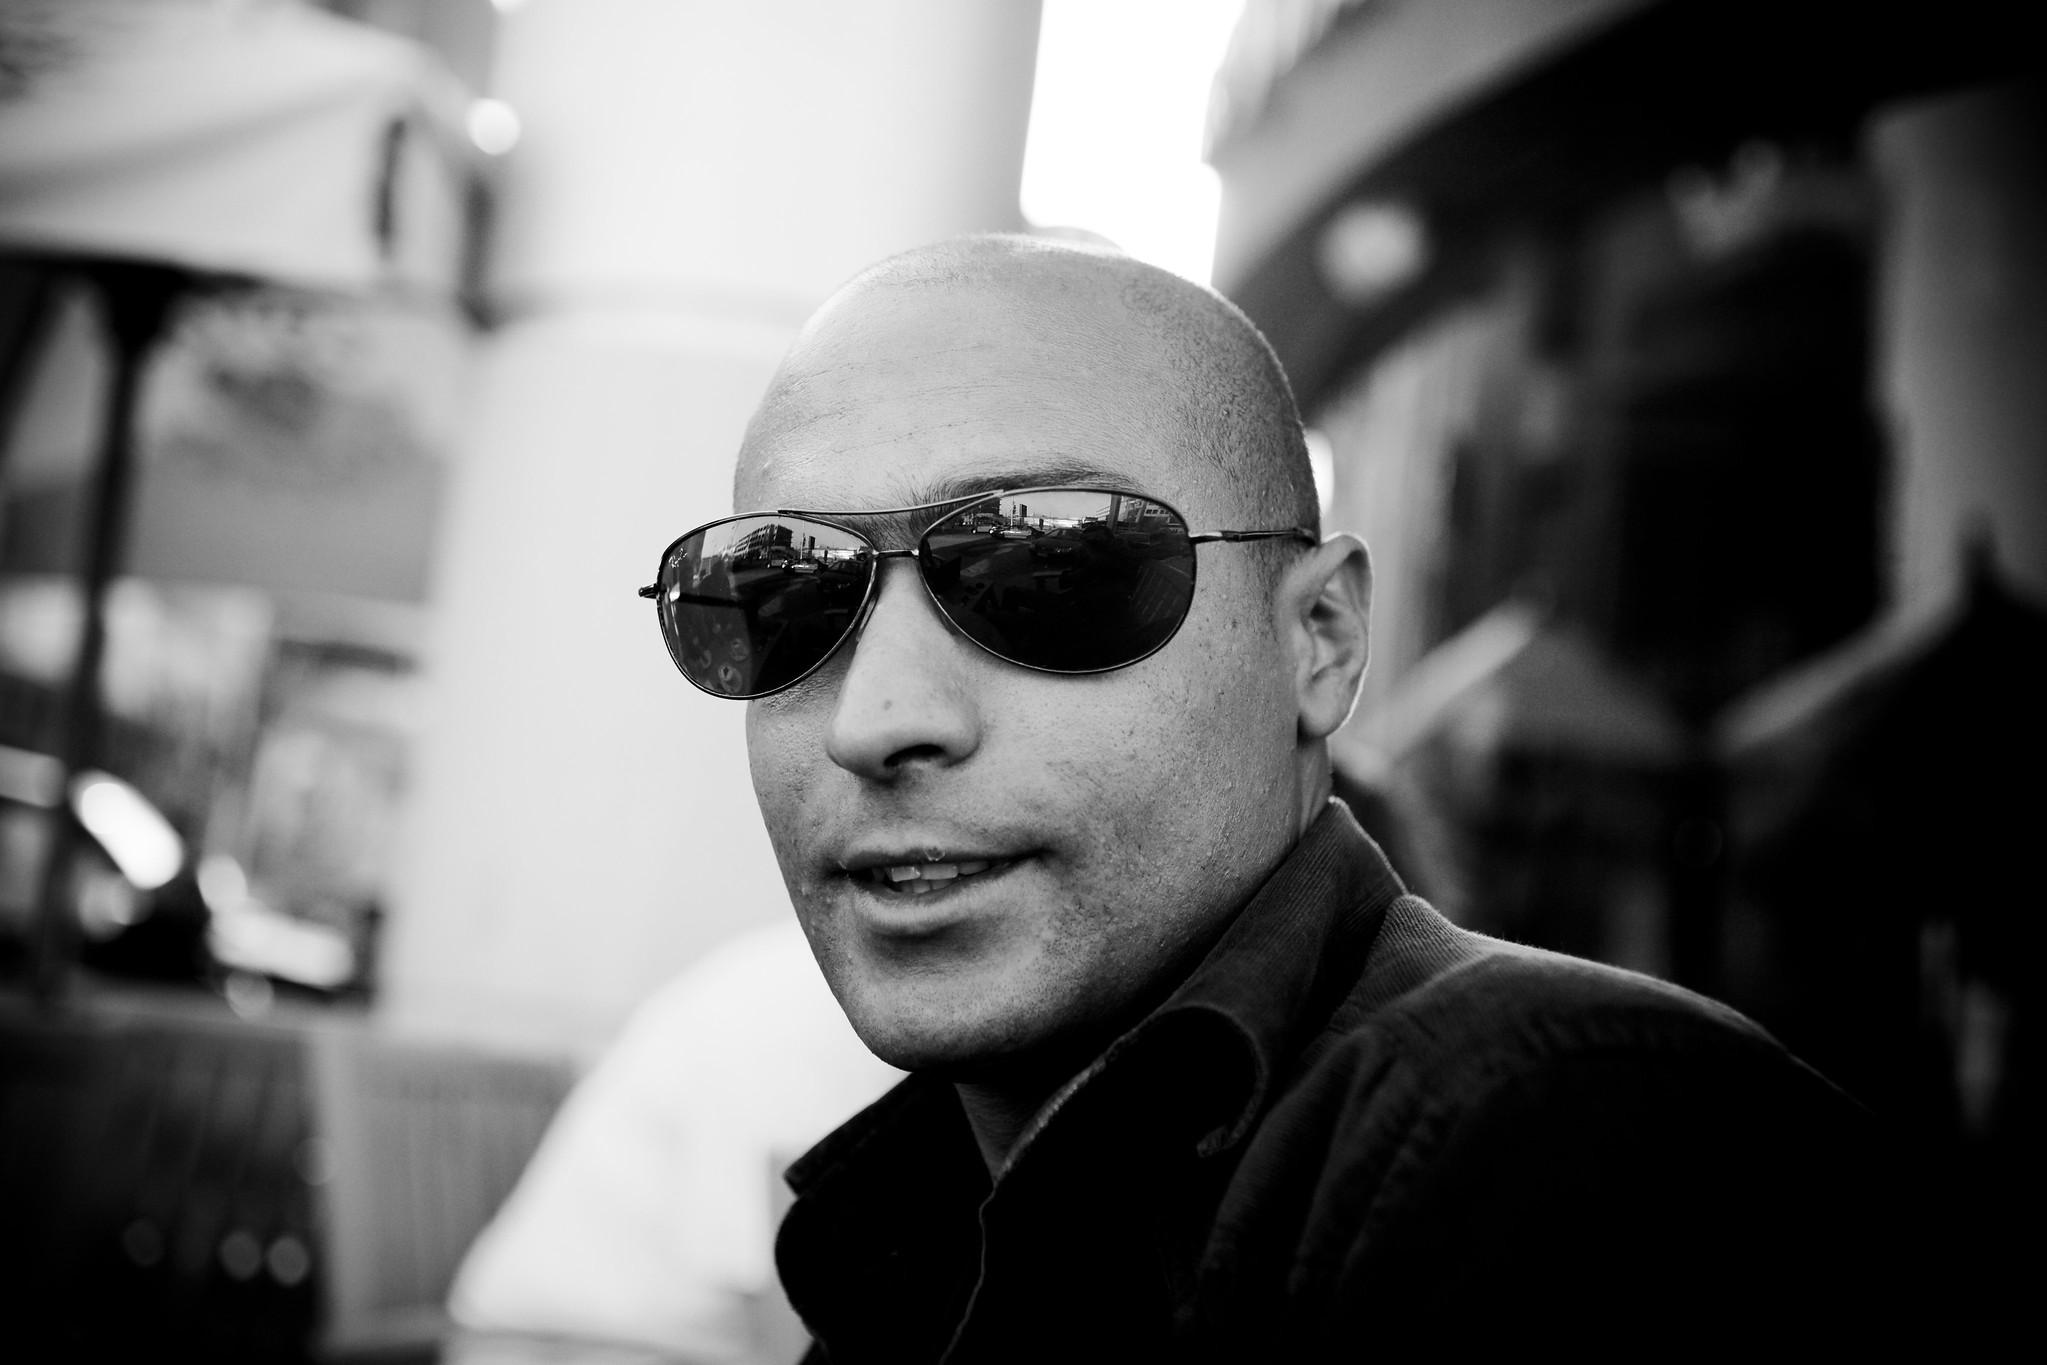 Ismail Marzouk